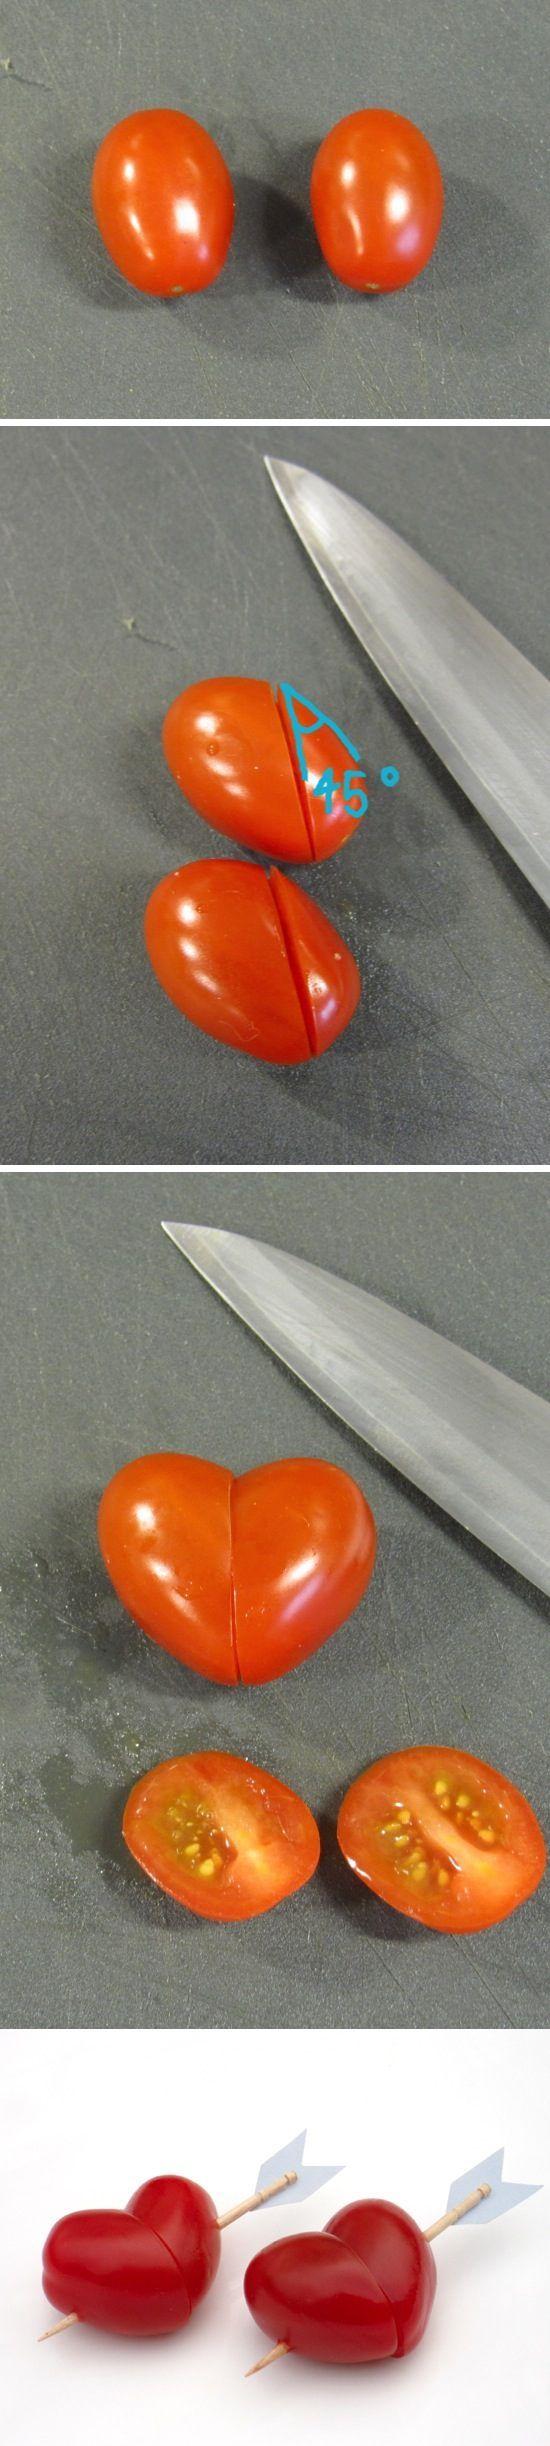 Heart Shaped Cherry Tomatoes   Recipe By Photo